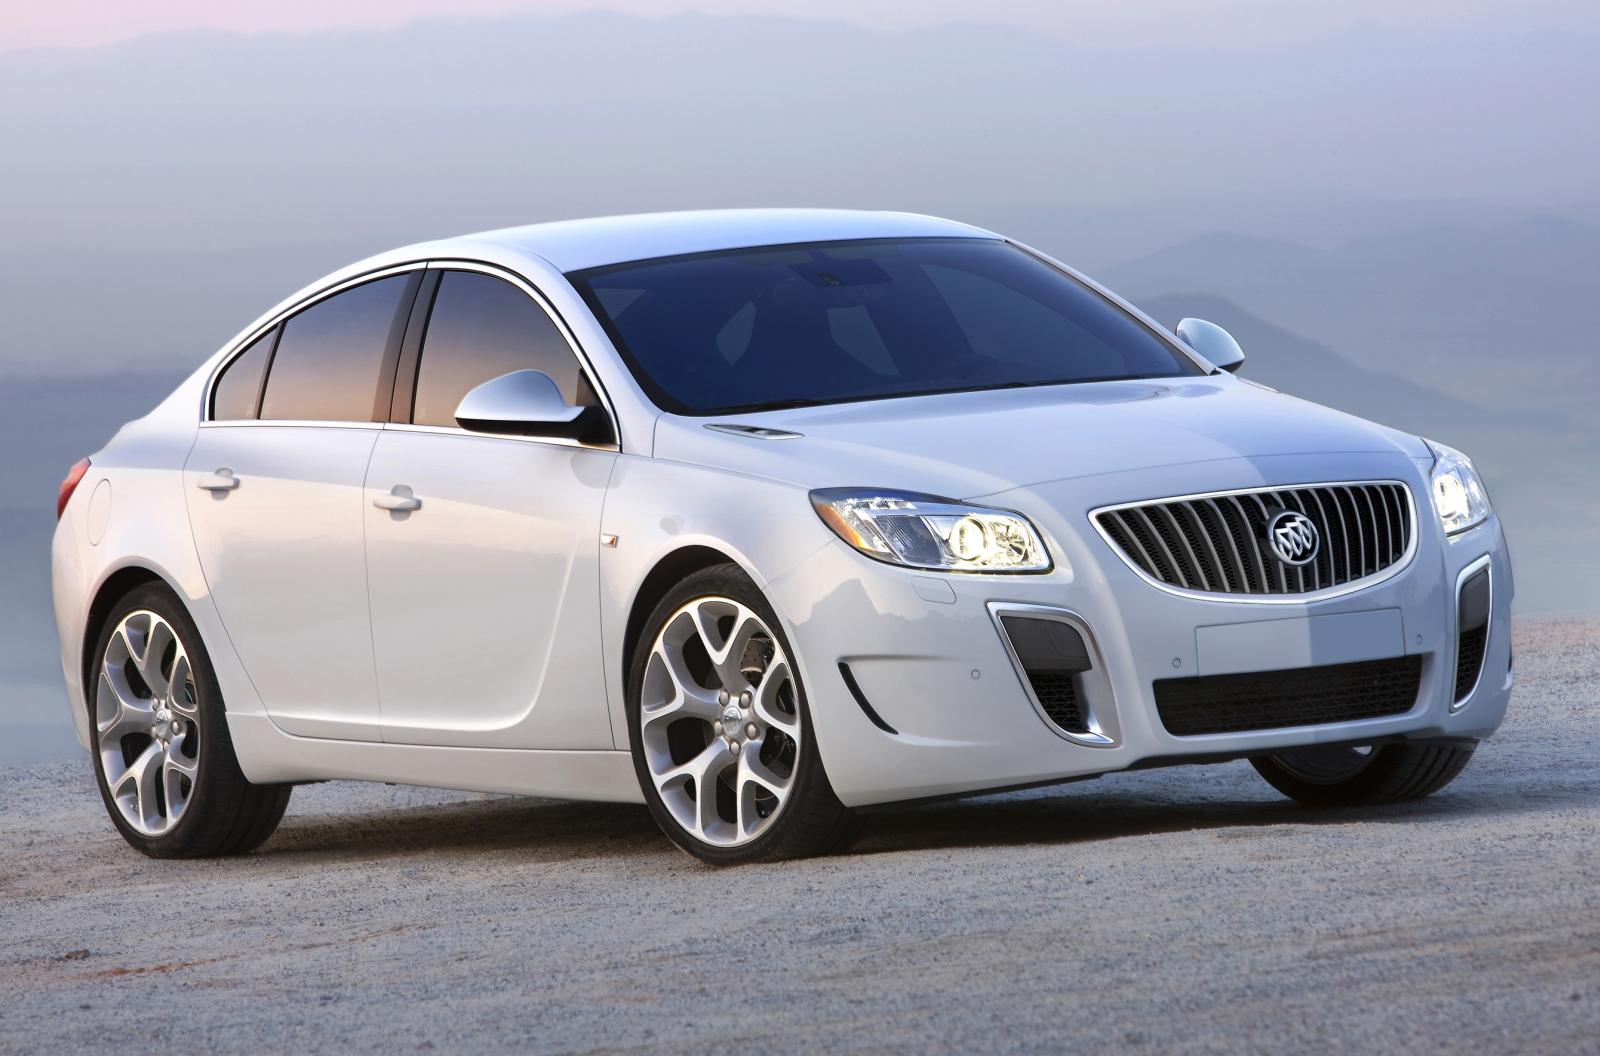 Buick Regal Gs 2012 Reviews Vivid Car